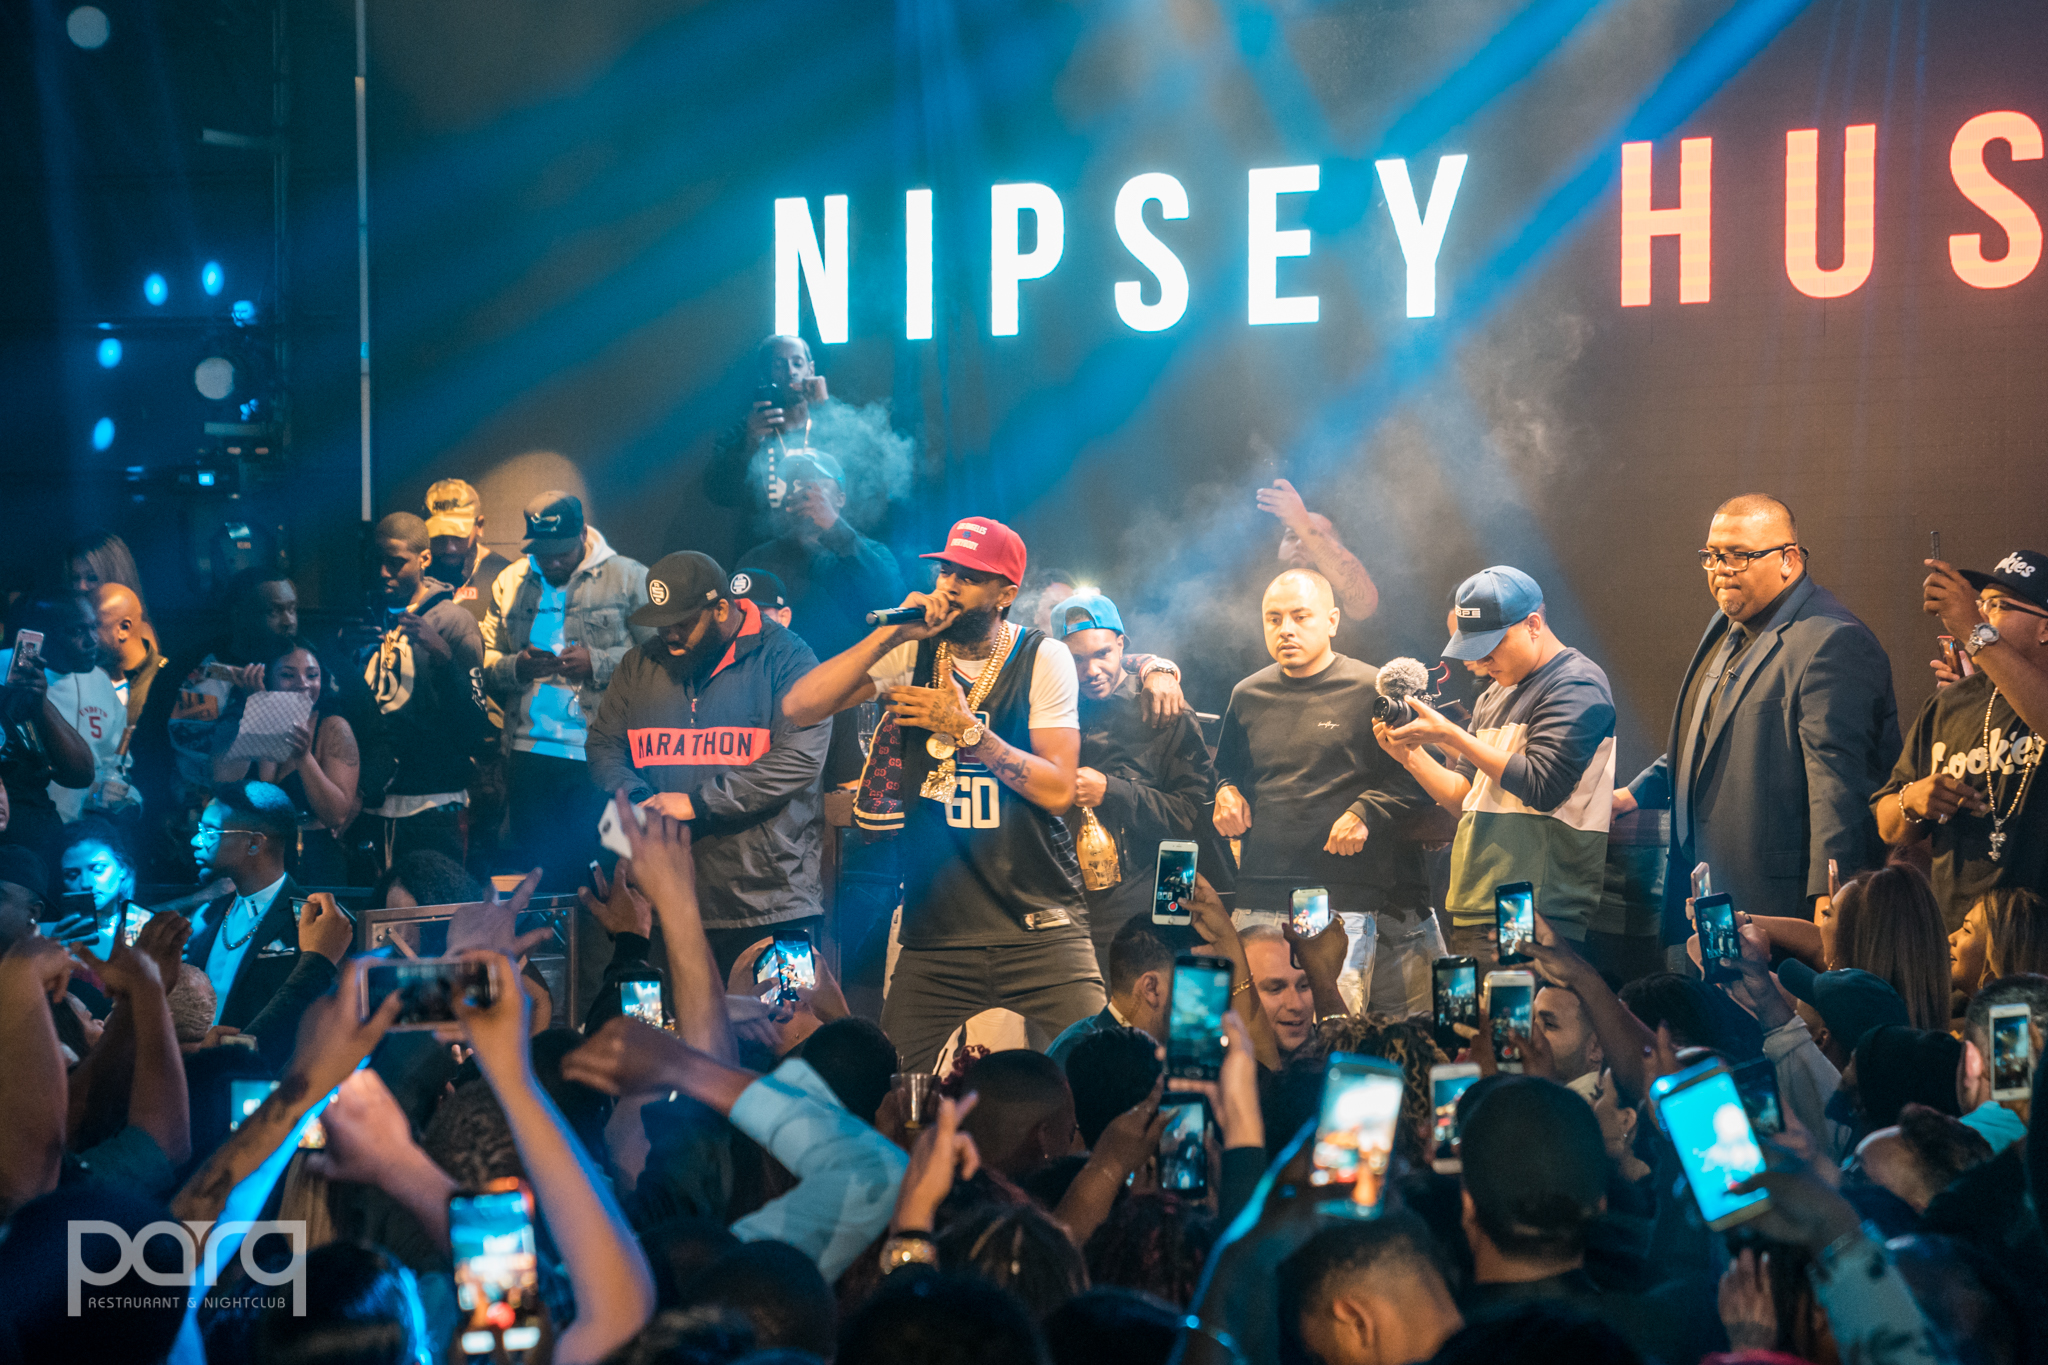 03.09.18 Parq - Nipsey Hussle-21.jpg